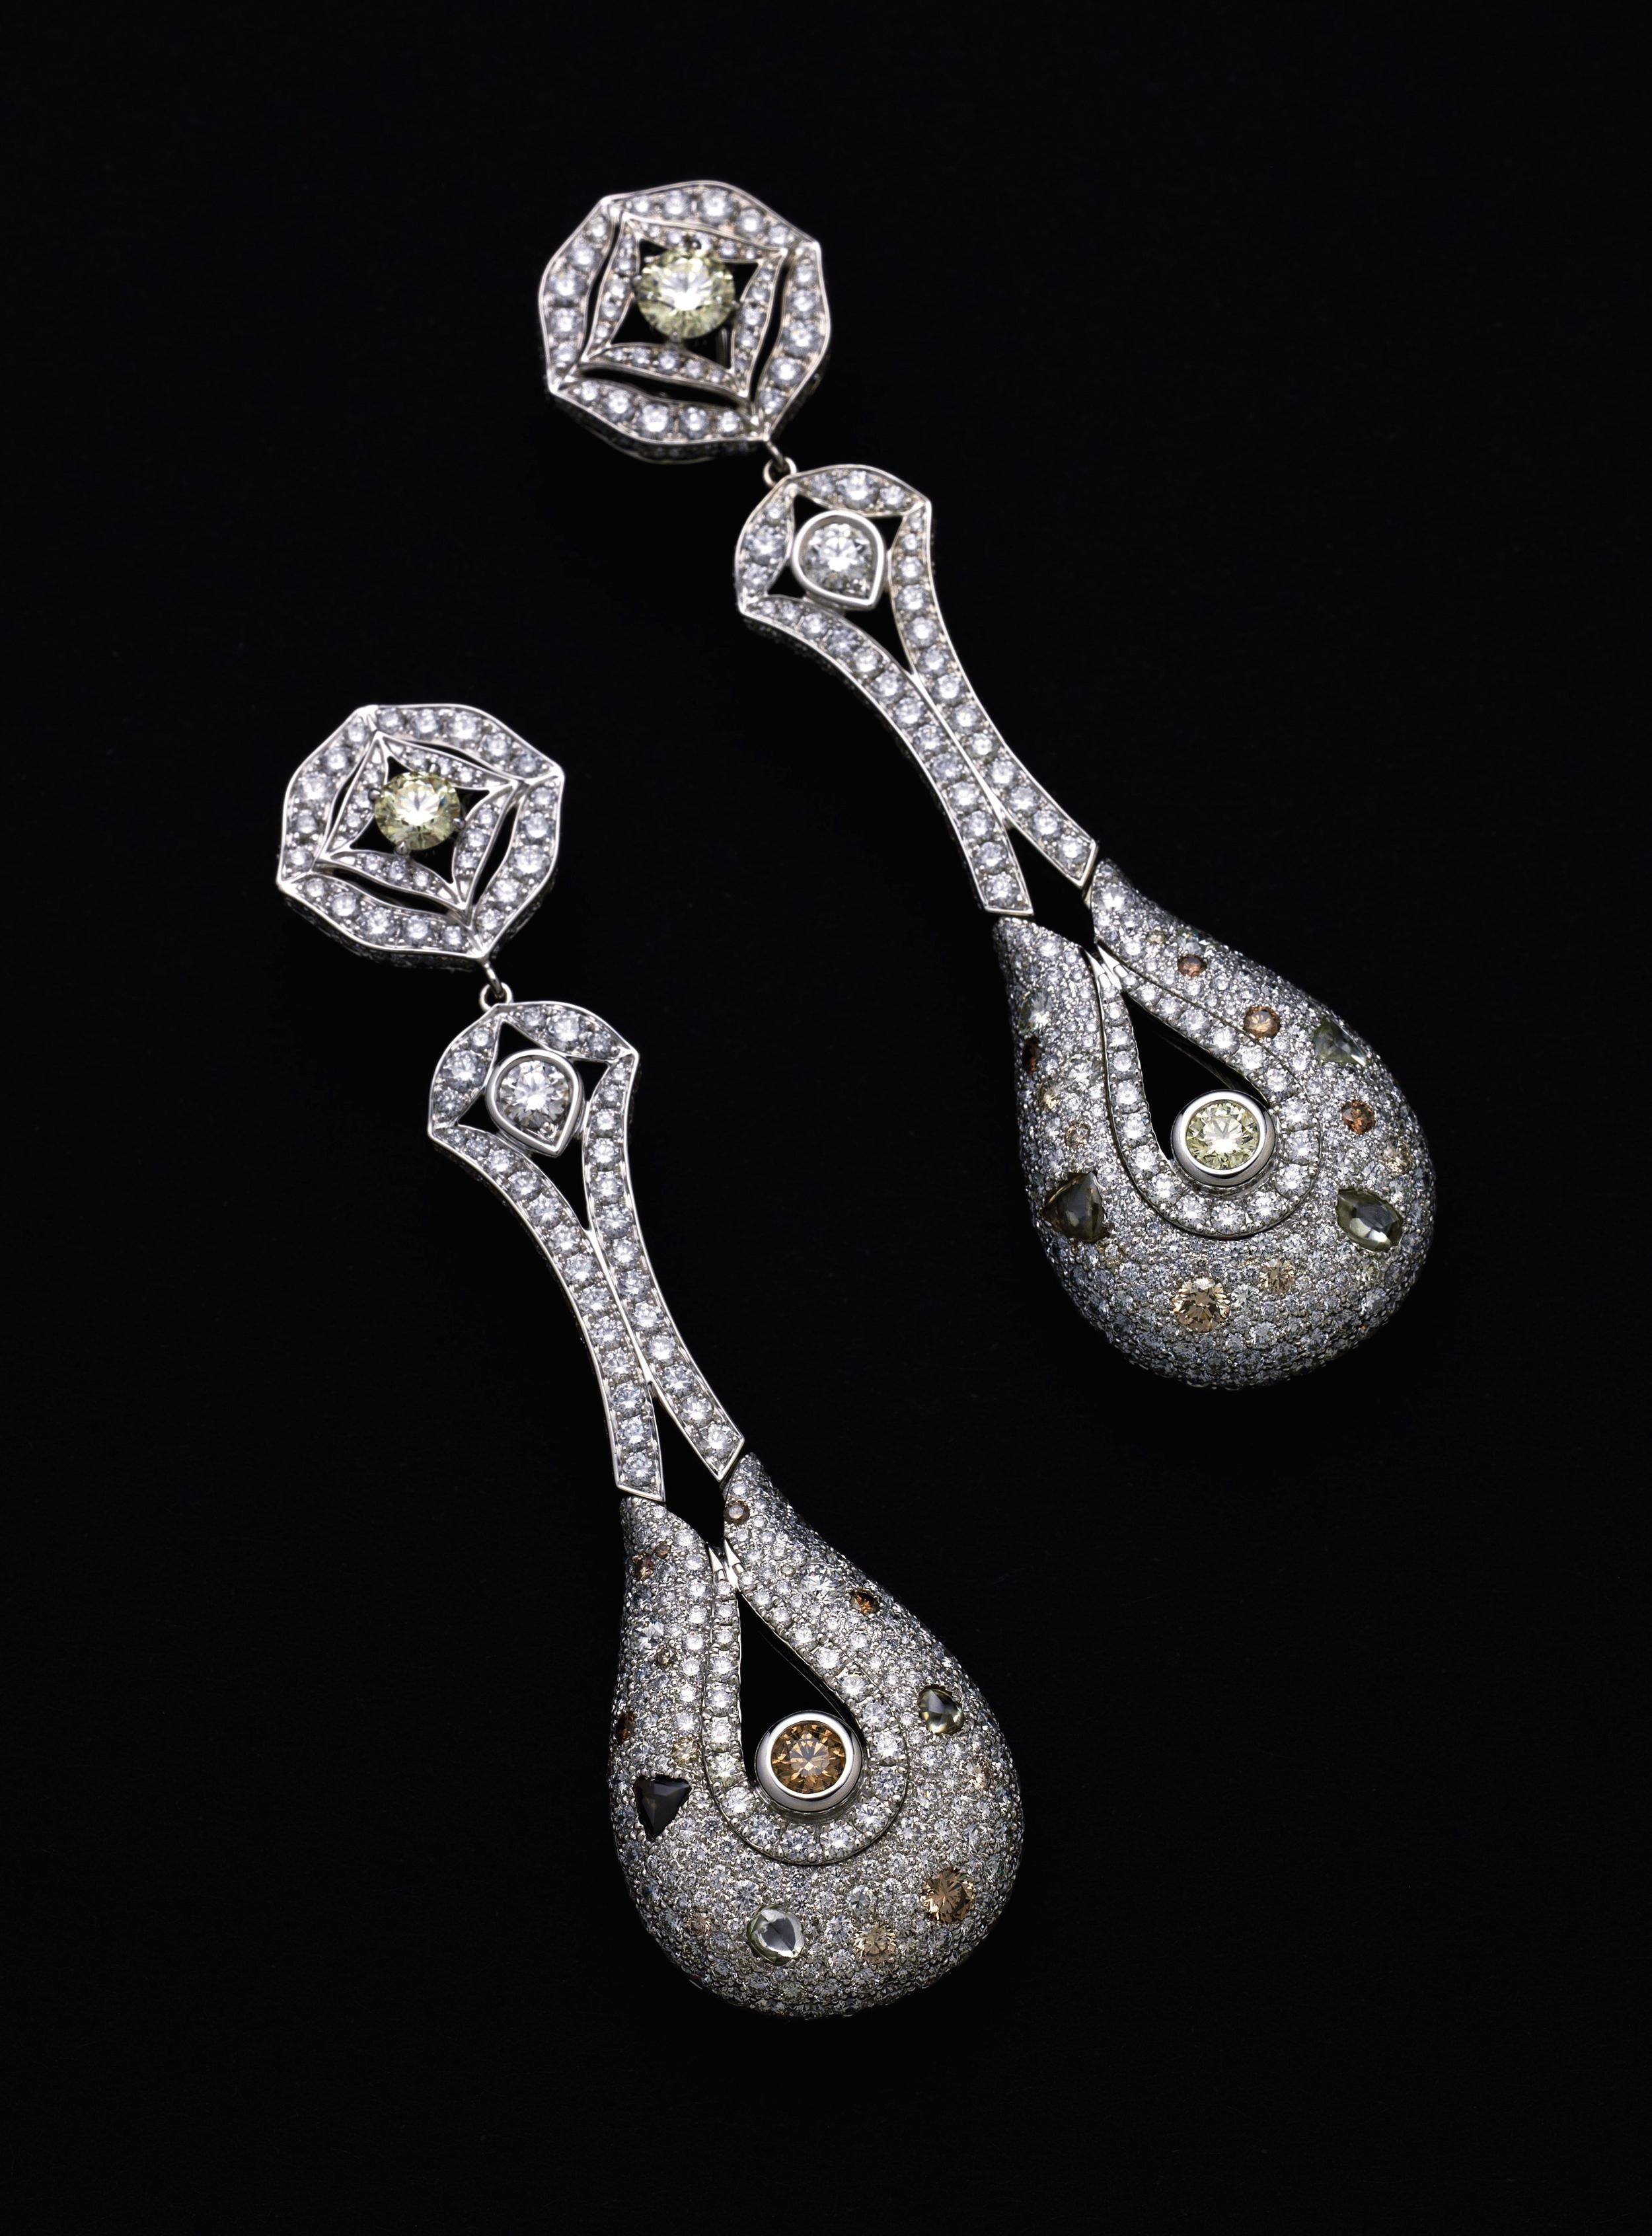 Rio Tinto Bunder Diamonds_Reena Ahluwalia Earrings.jpg